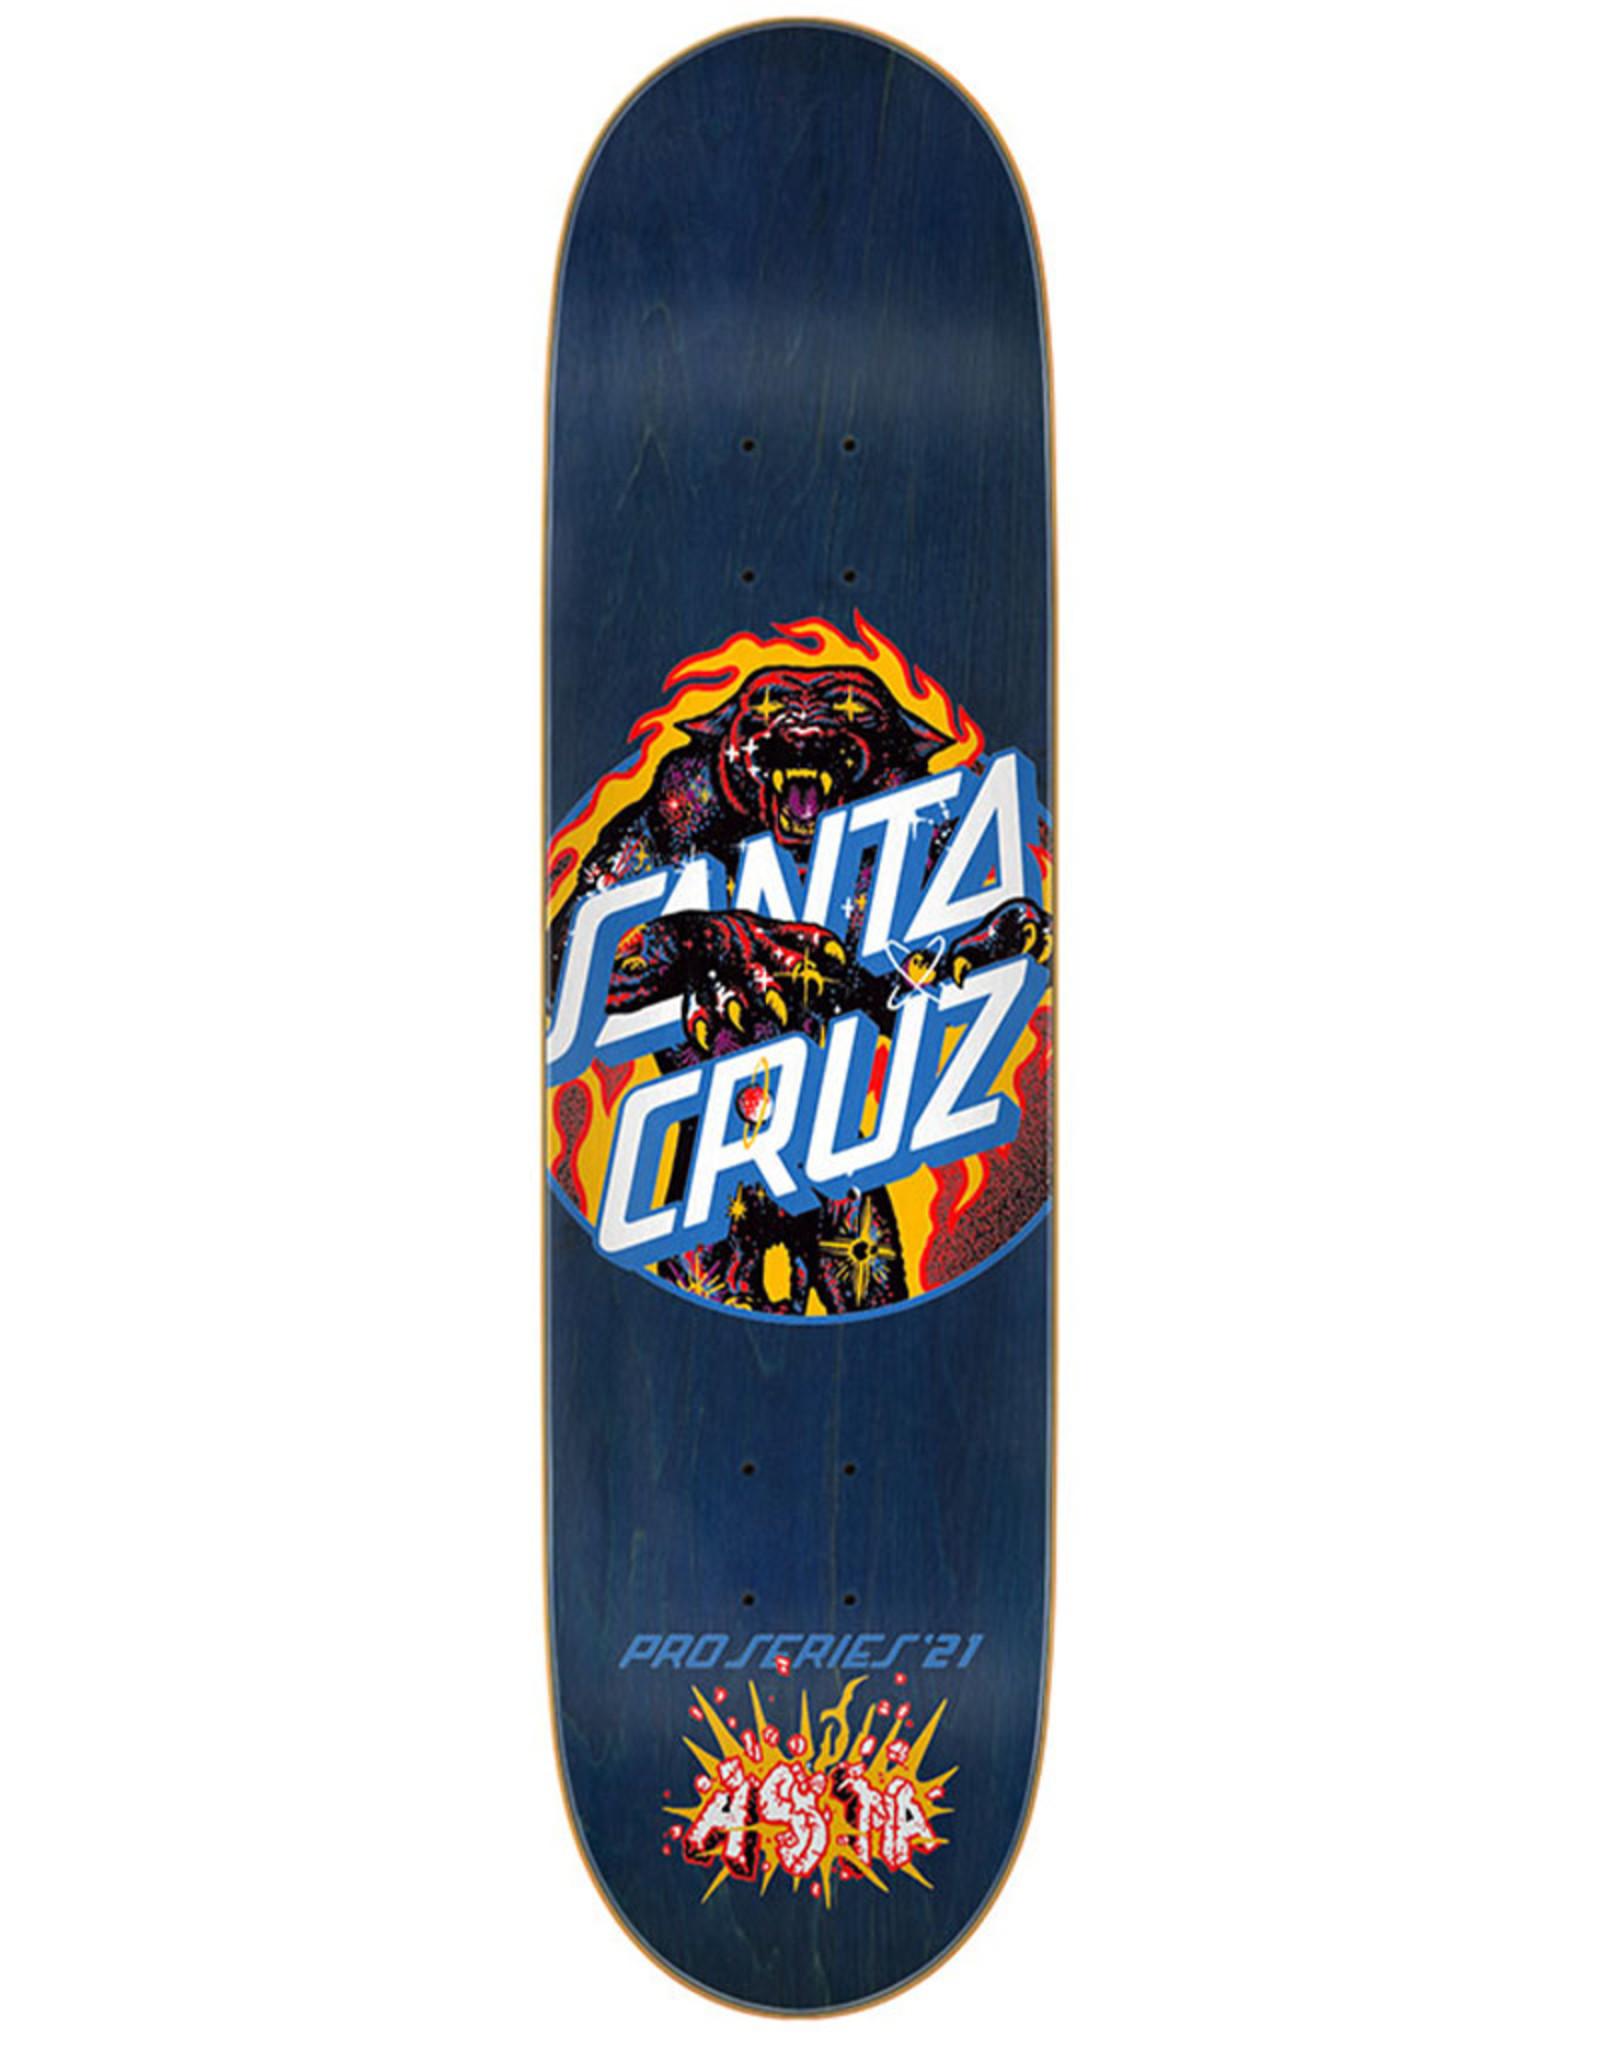 Santa Cruz Santa Cruz Deck Tom Asta Cosmic Cat Dot (8.0)